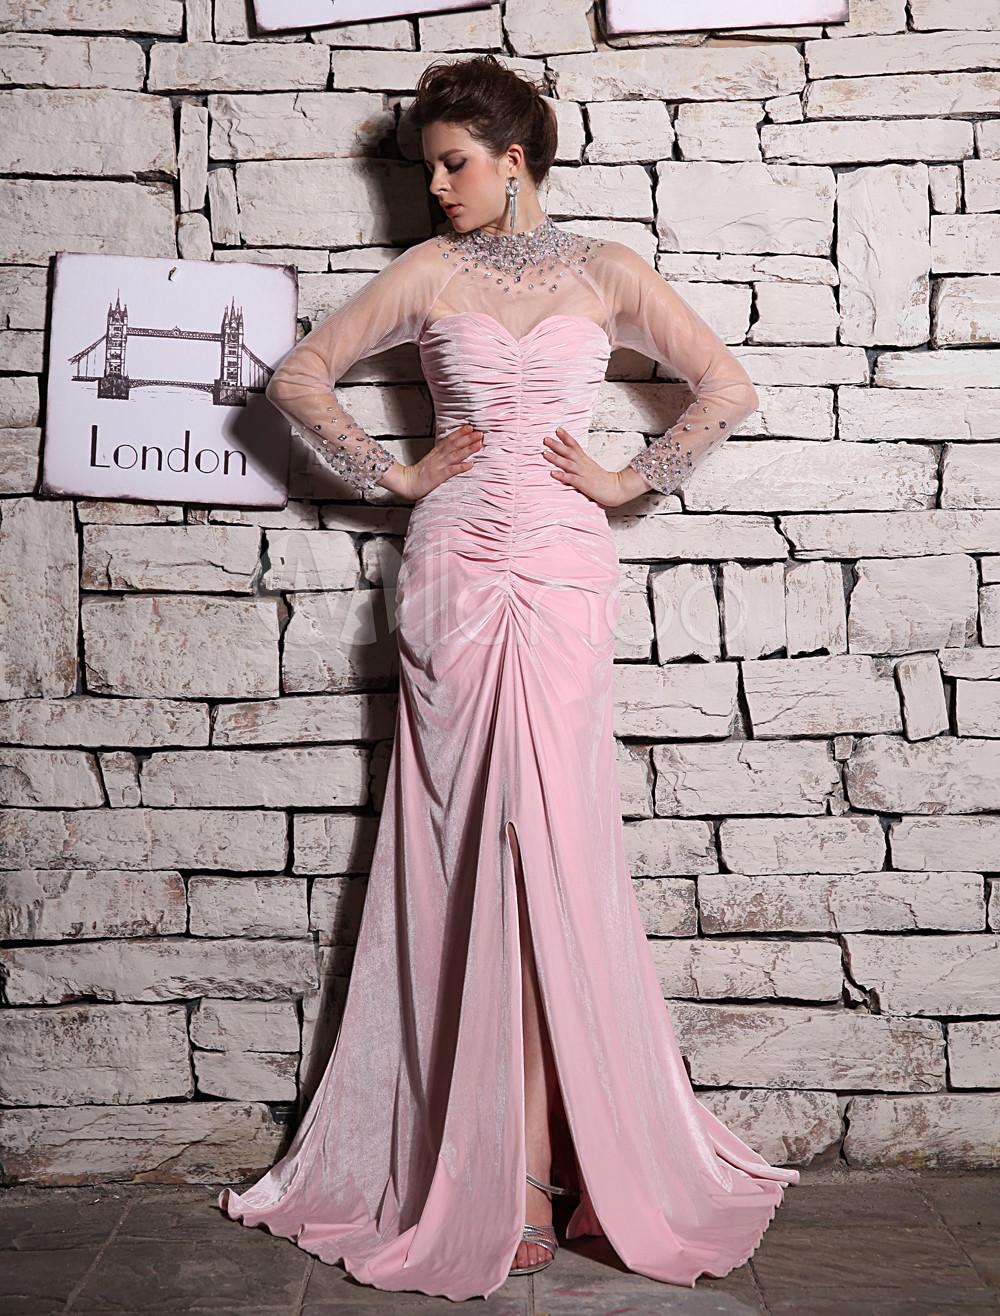 Pink High Collar Floor-Length Velvet Evening Dress Milanoo (Wedding Evening Dresses) photo